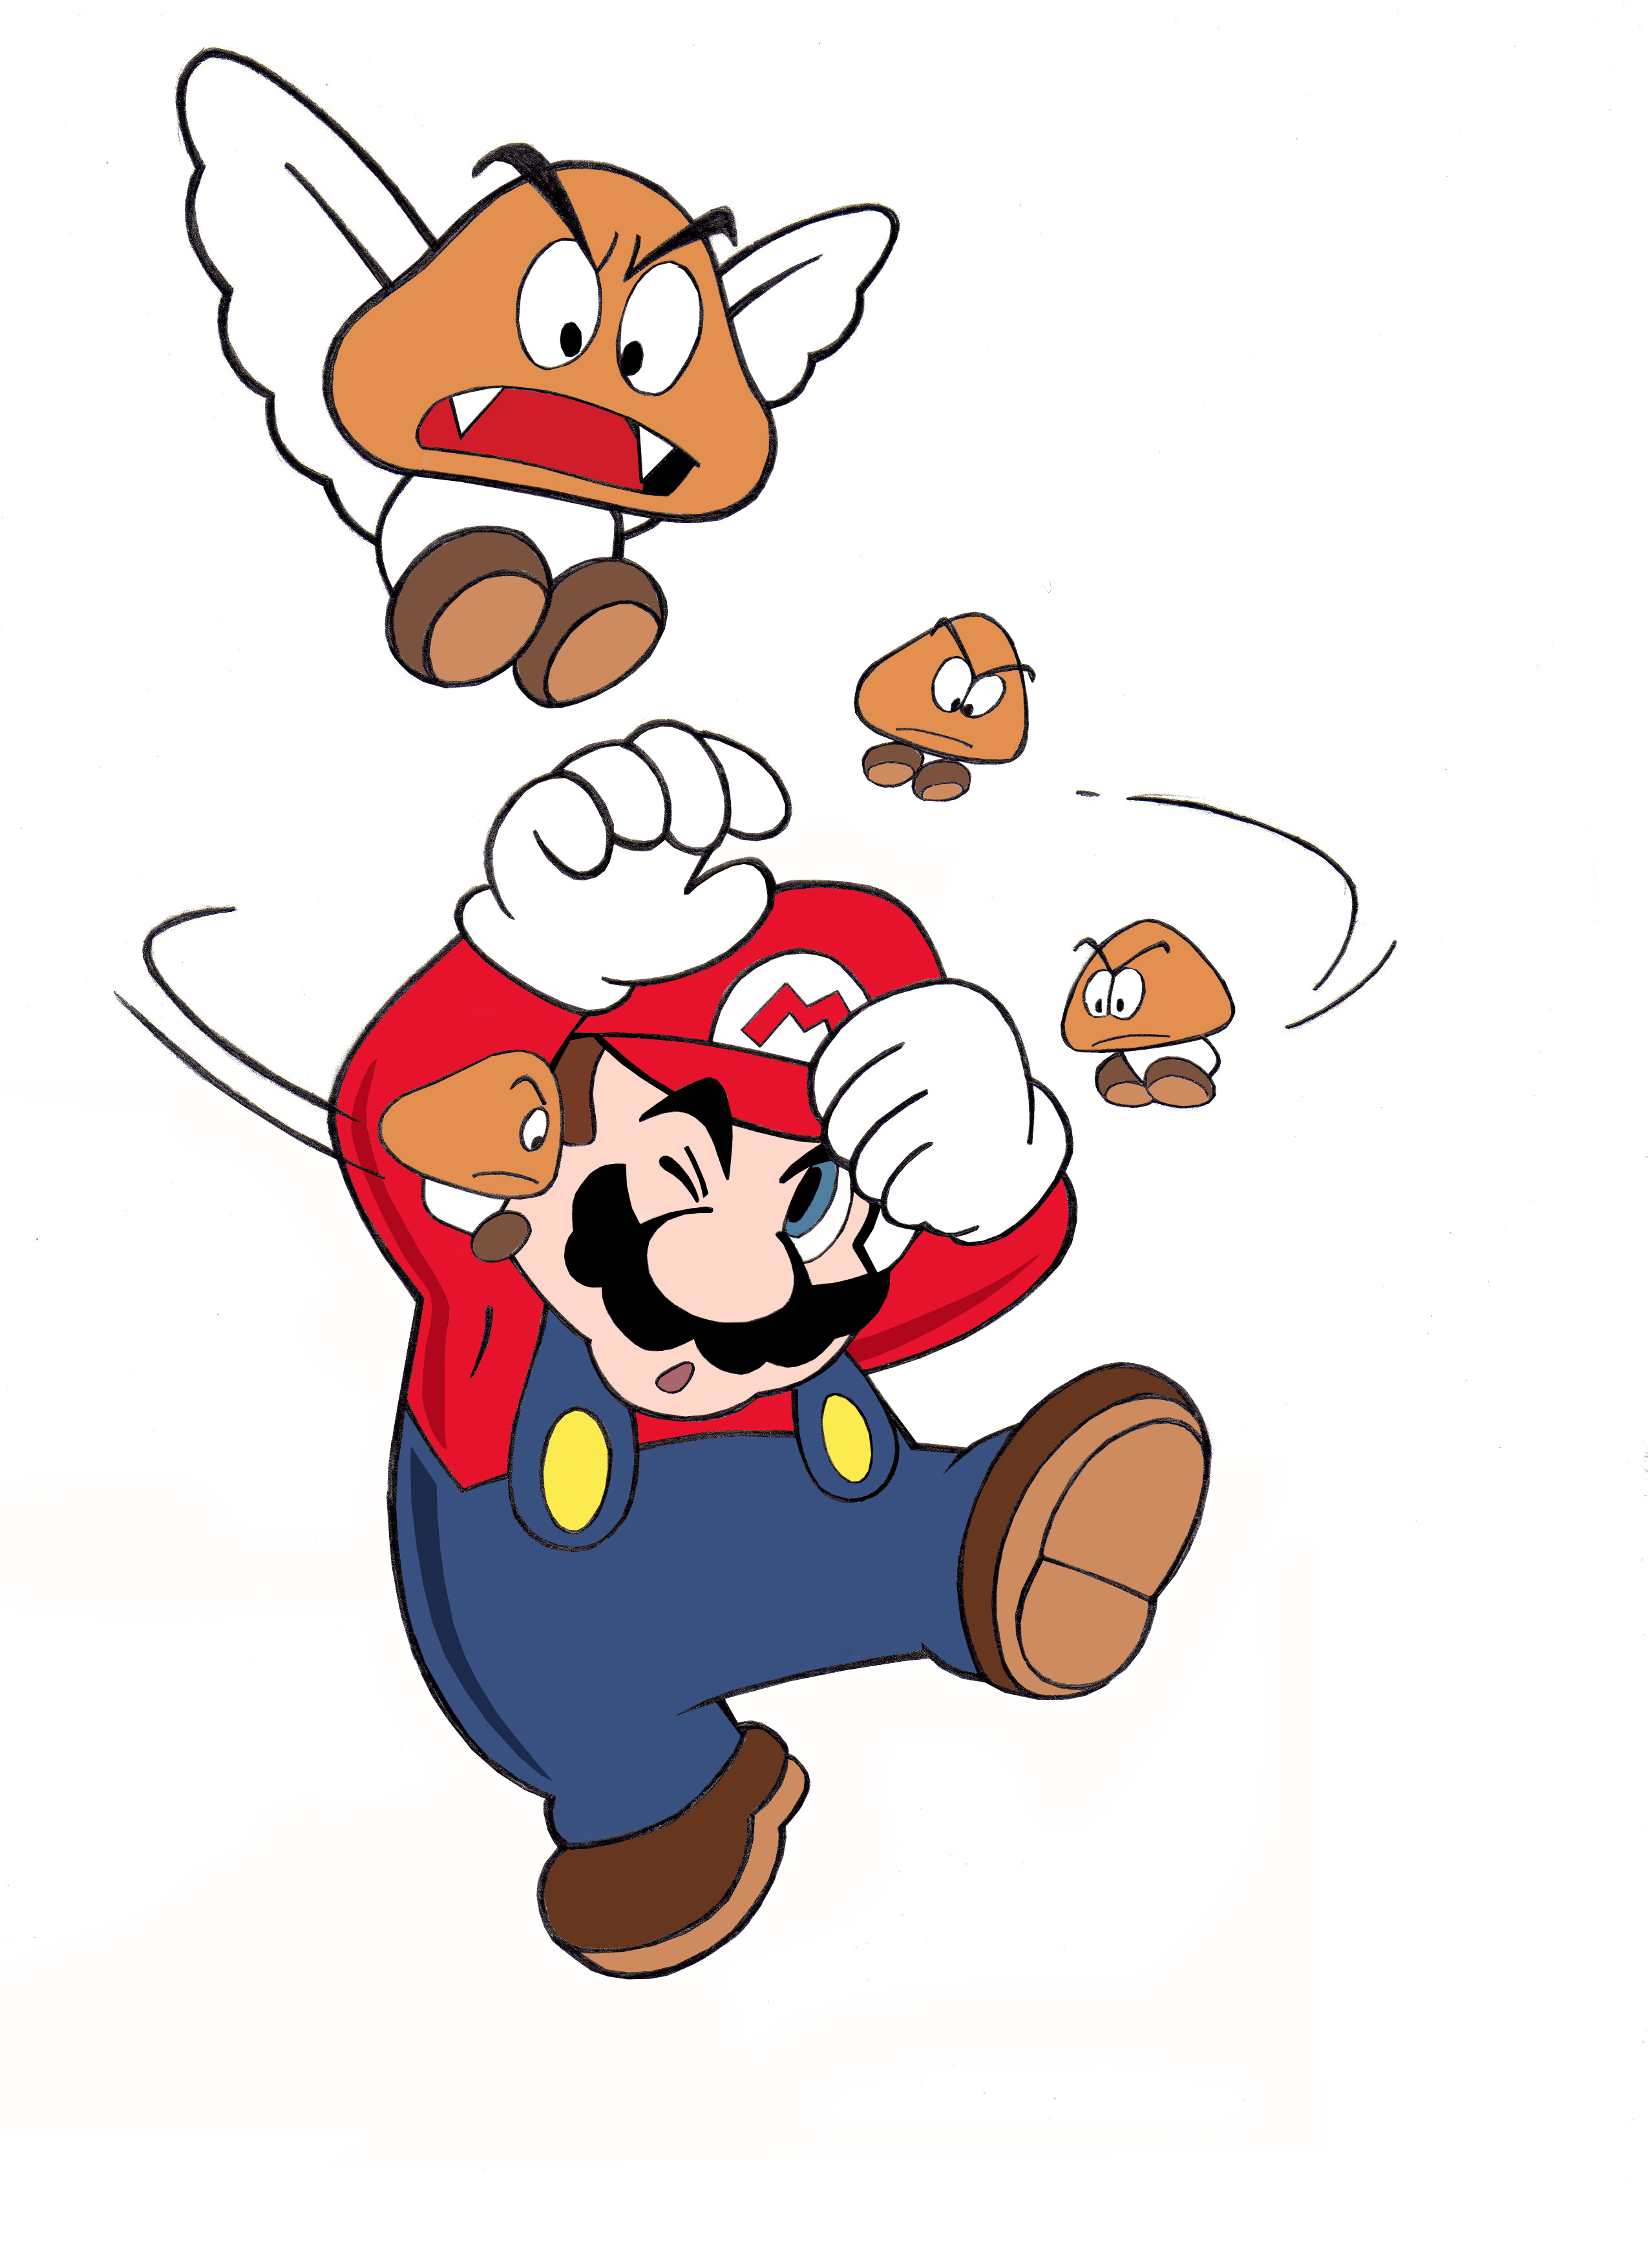 Dessin Super Mario couleur de Adrien72140